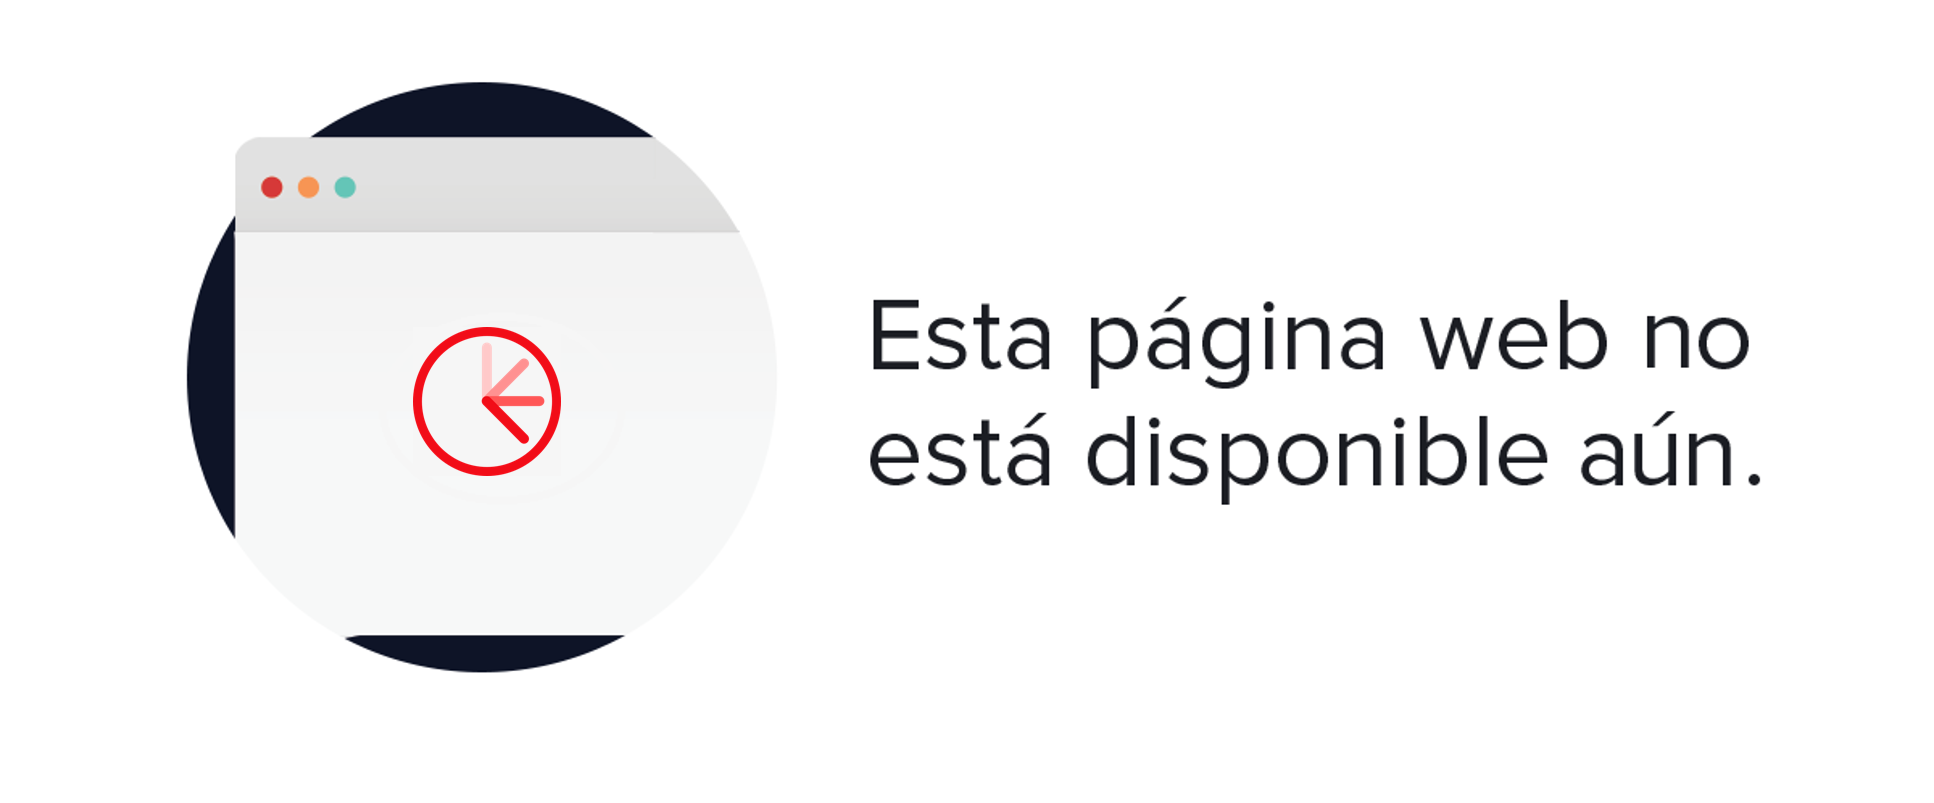 Amitie - Pantalón pitillo de mujer Amitié con cinco bolsillos Azul marino 001035117100525036 - HQDPZPL